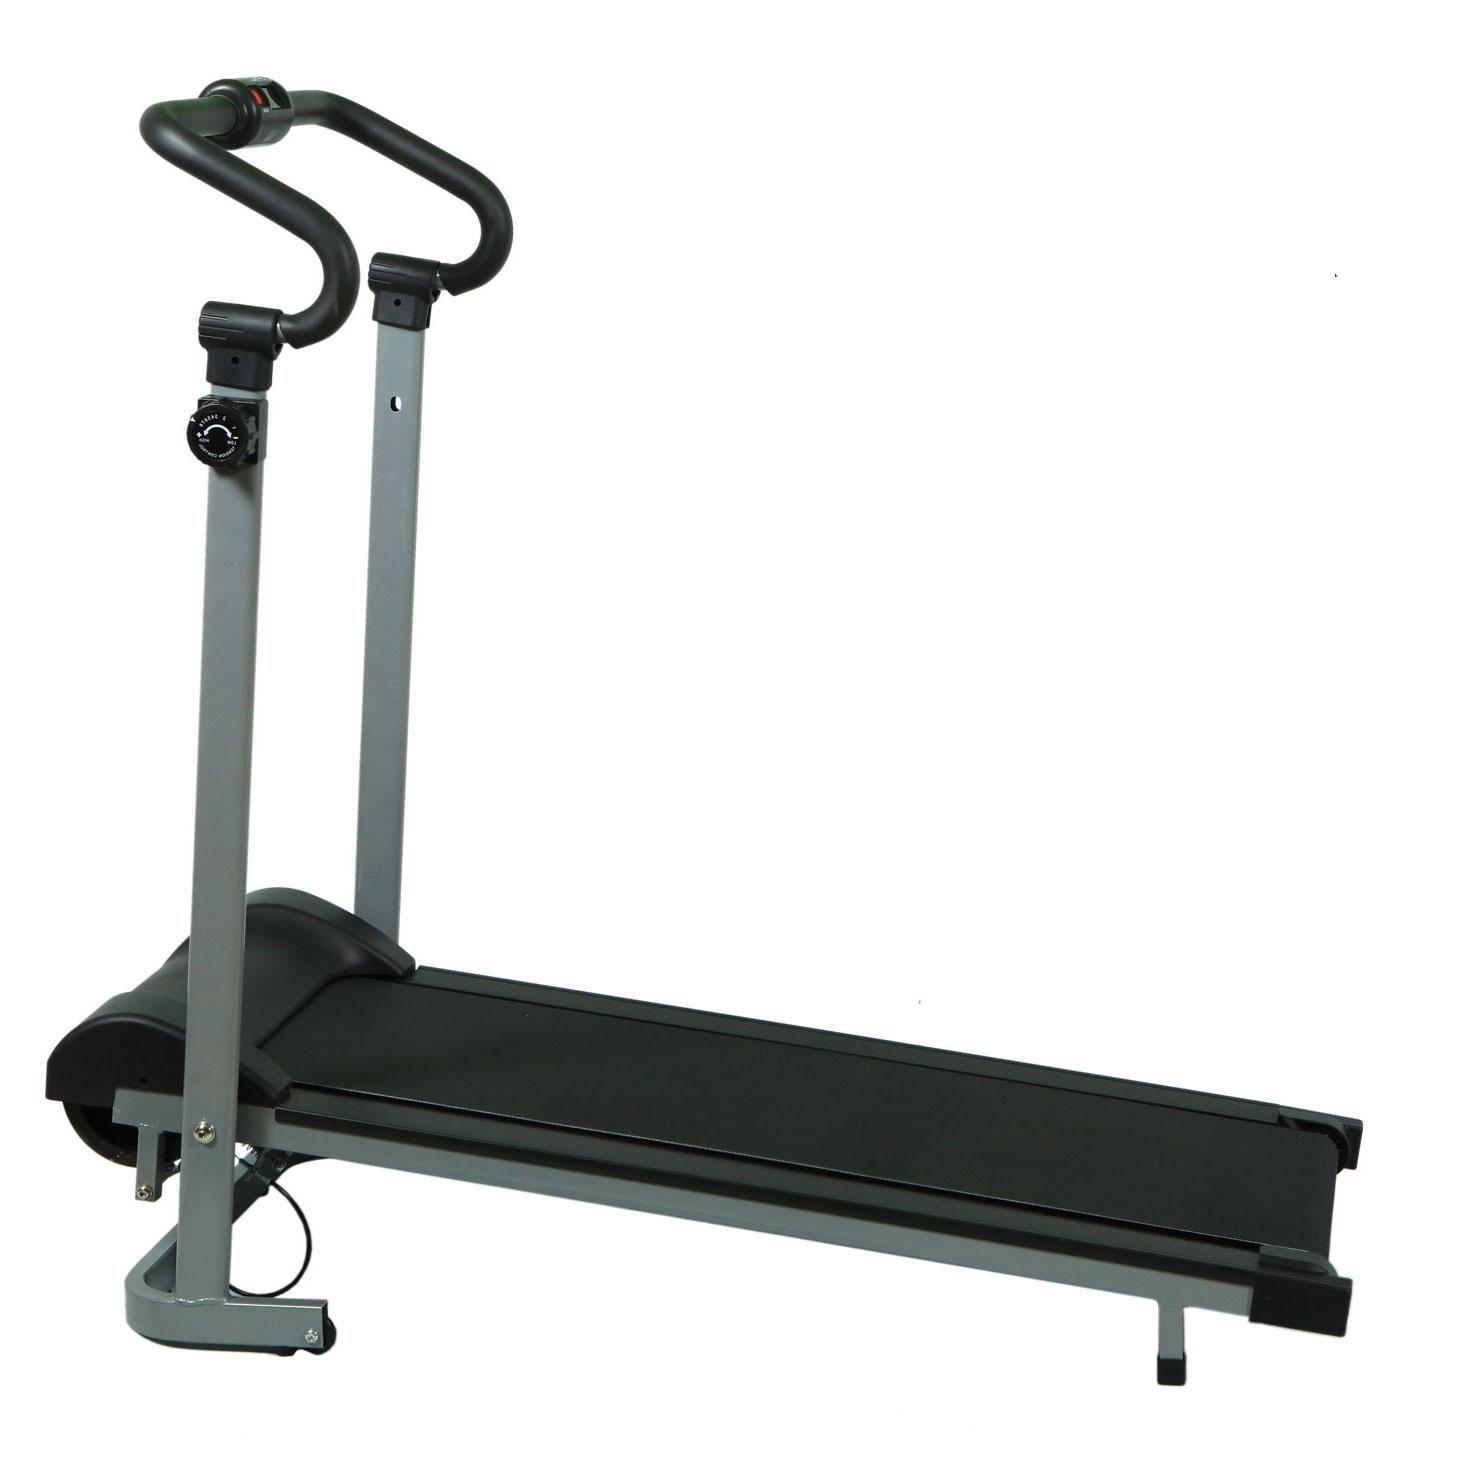 MB Barbell / Mechanical treadmill DFC T1004